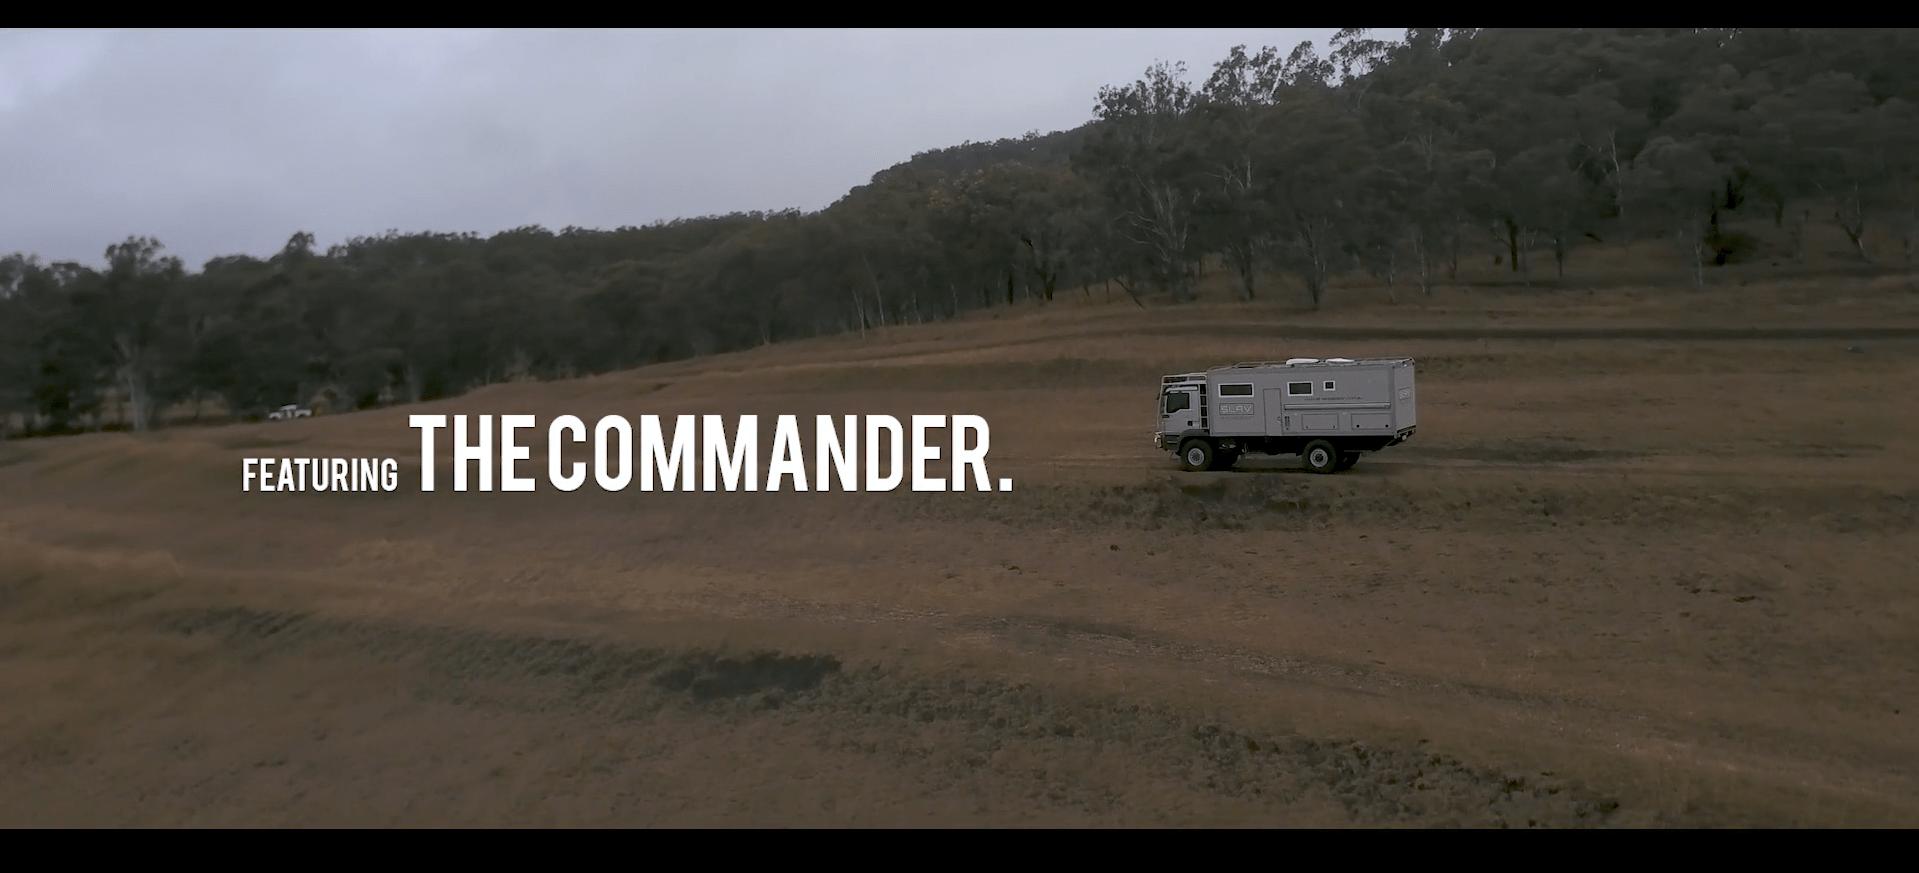 SLRV Expedition commander - AusGarage video production-min